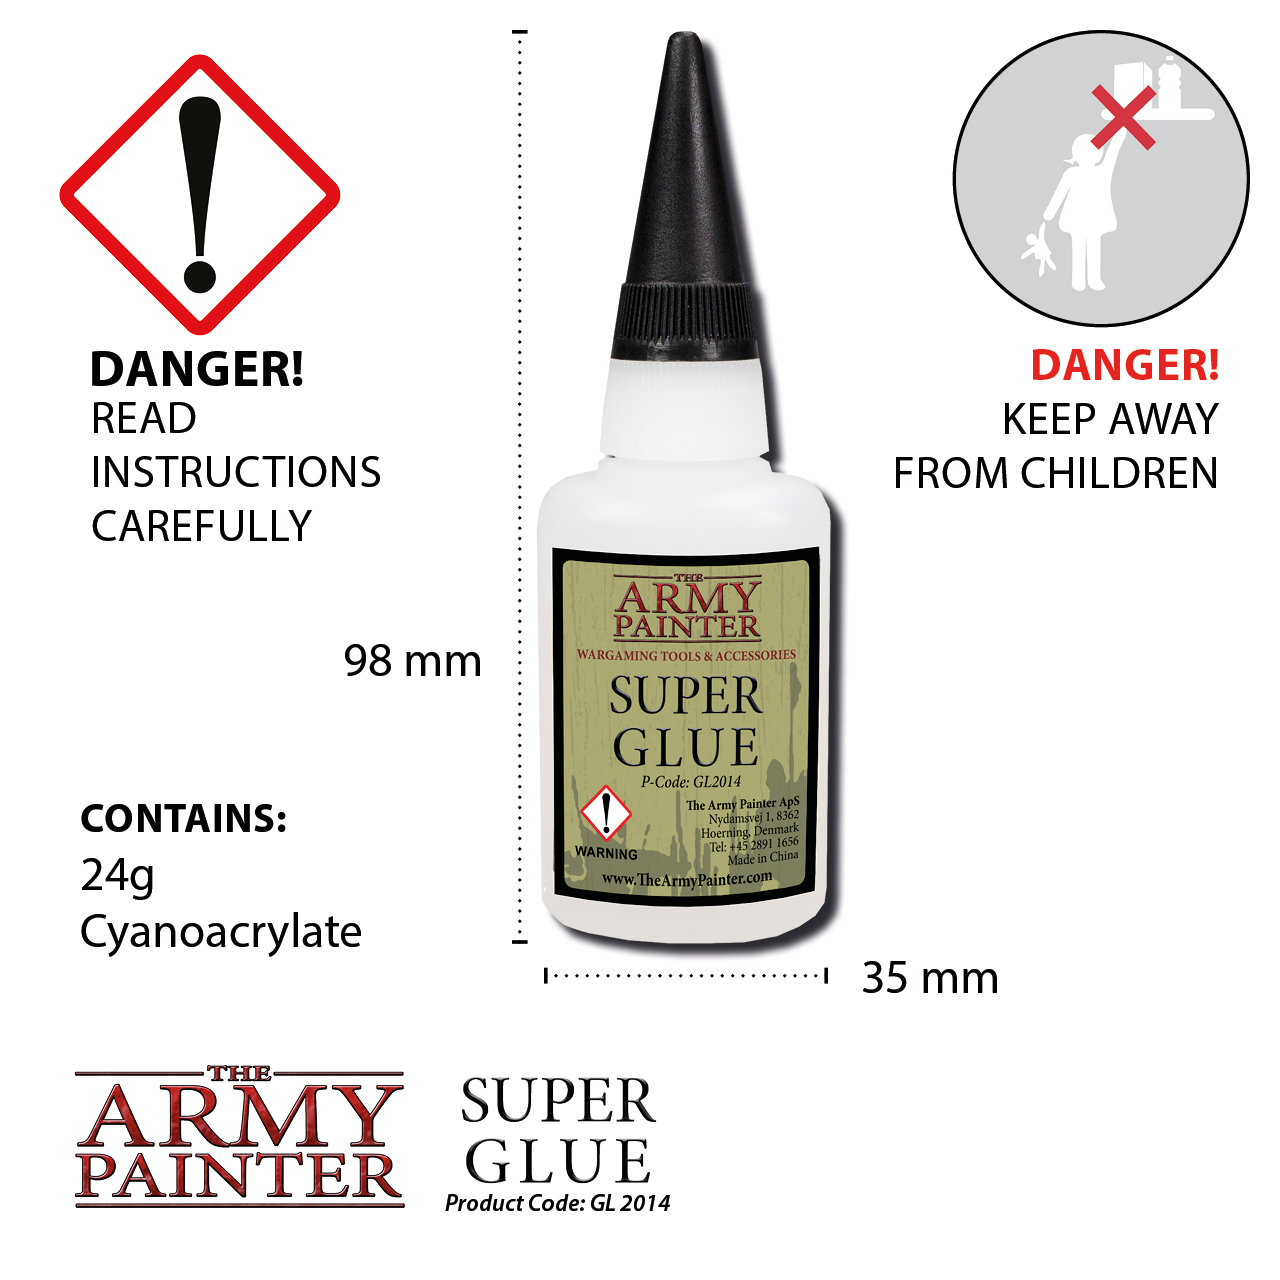 Army Painter Super Glue image